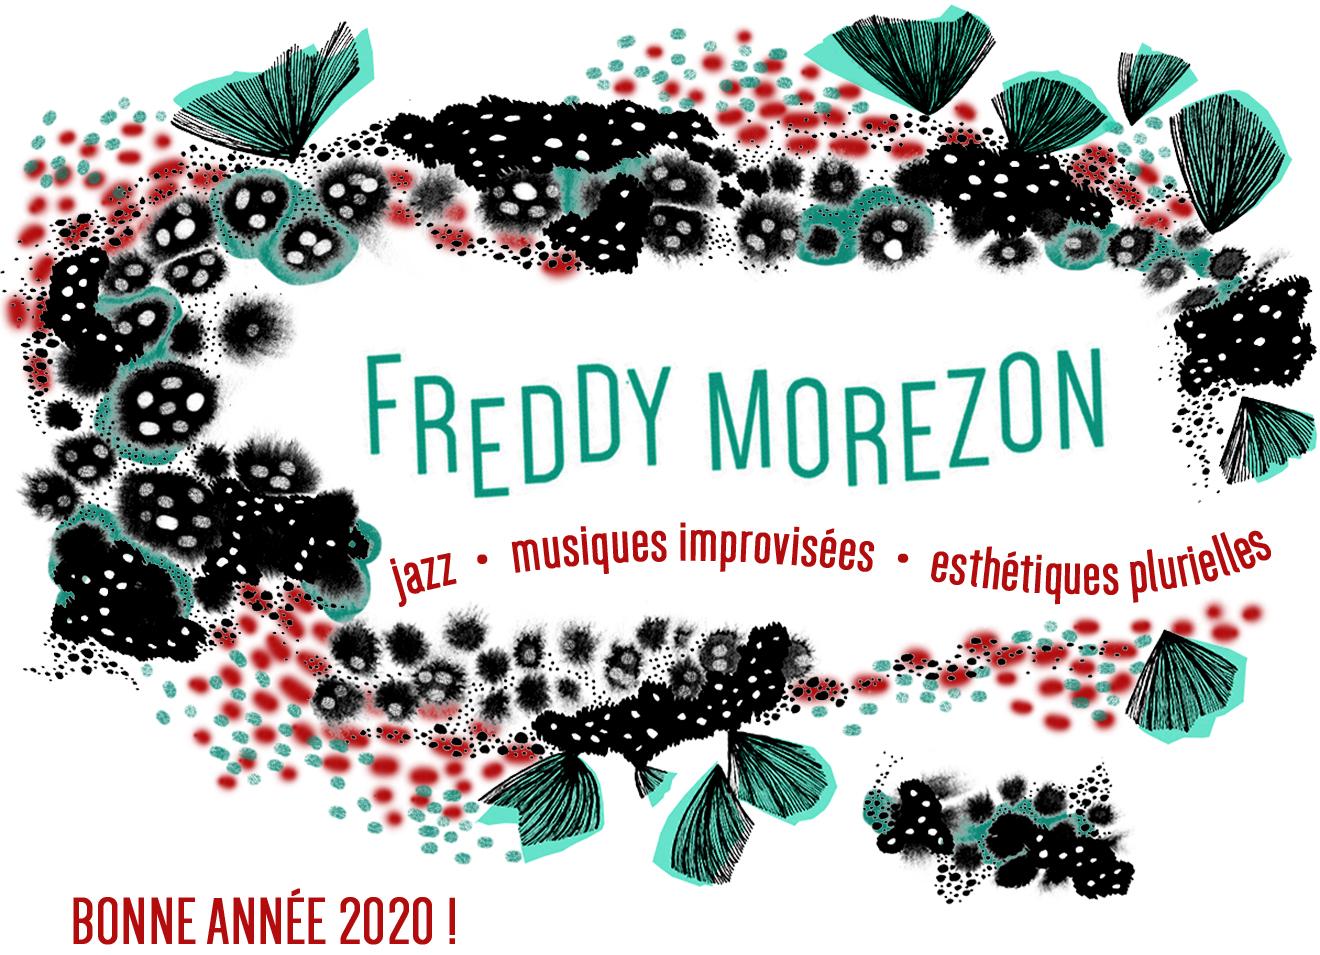 Freddy Morezon - Newsletter janvier 2020